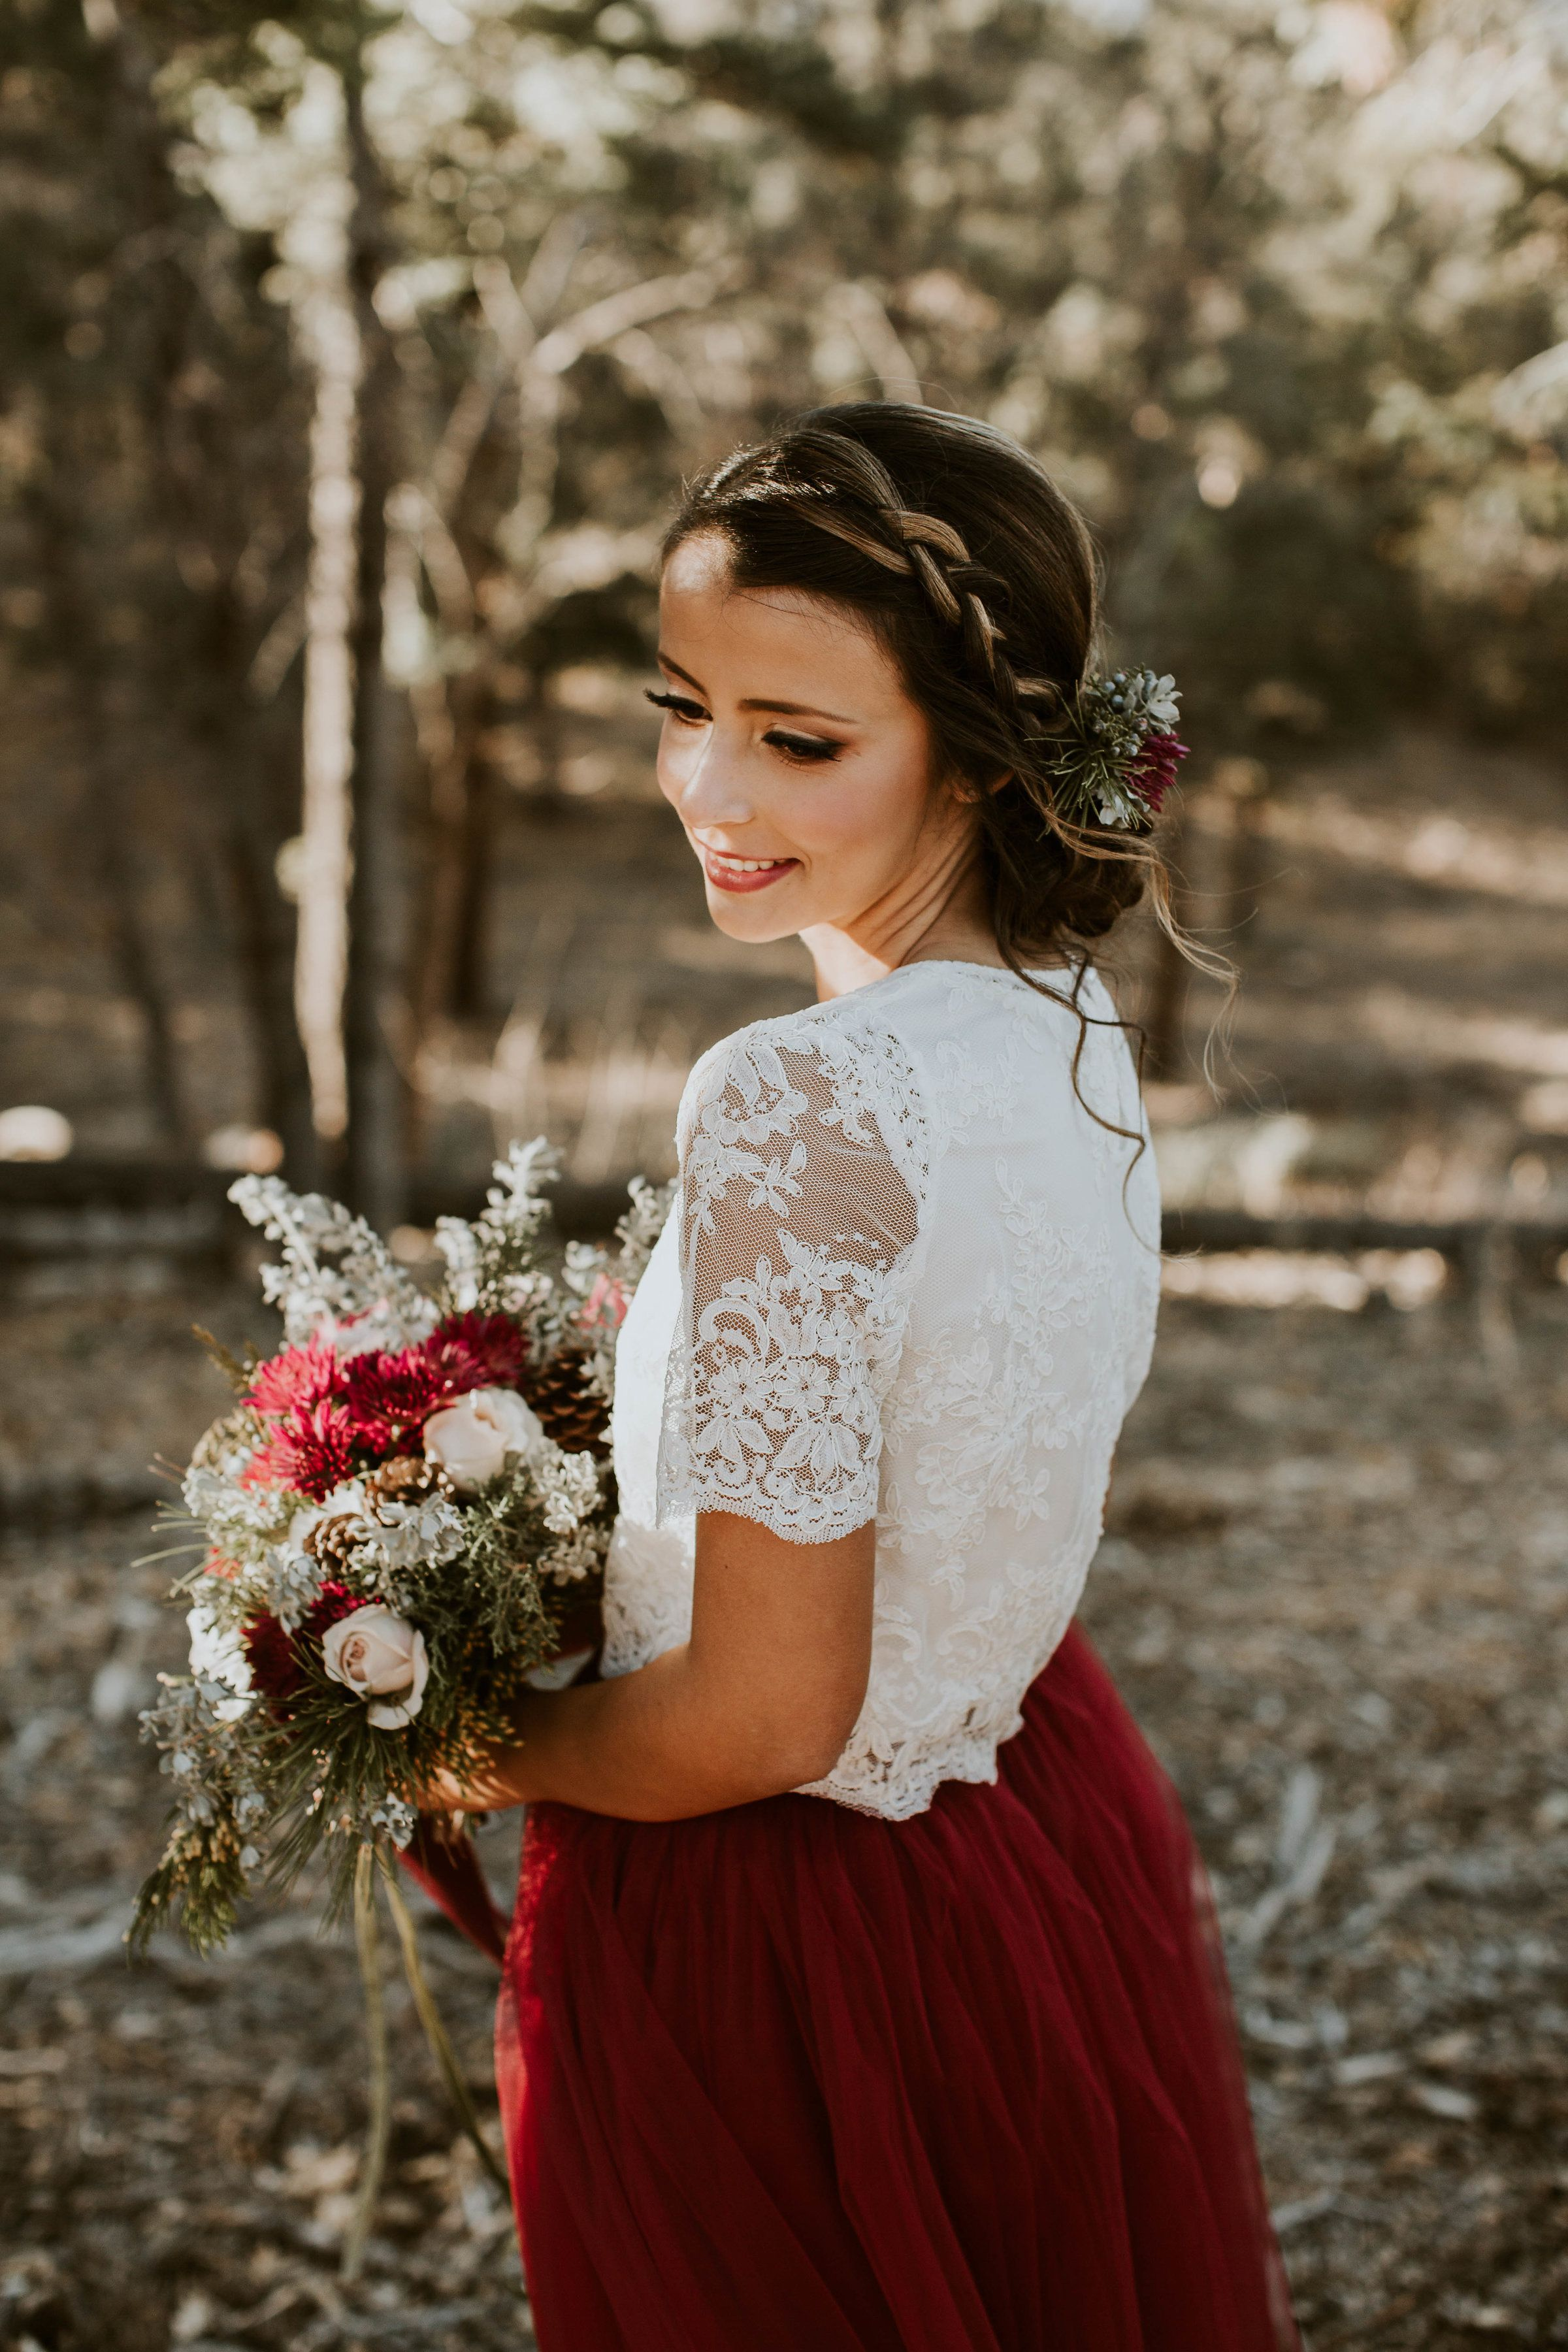 Belle Wedding Lace Crop Top White Lace Crop Top Tops Etsy White Lace Bridesmaid Lace Bridesmaid Top Long Sleeve Sequin Top [ 3600 x 2400 Pixel ]